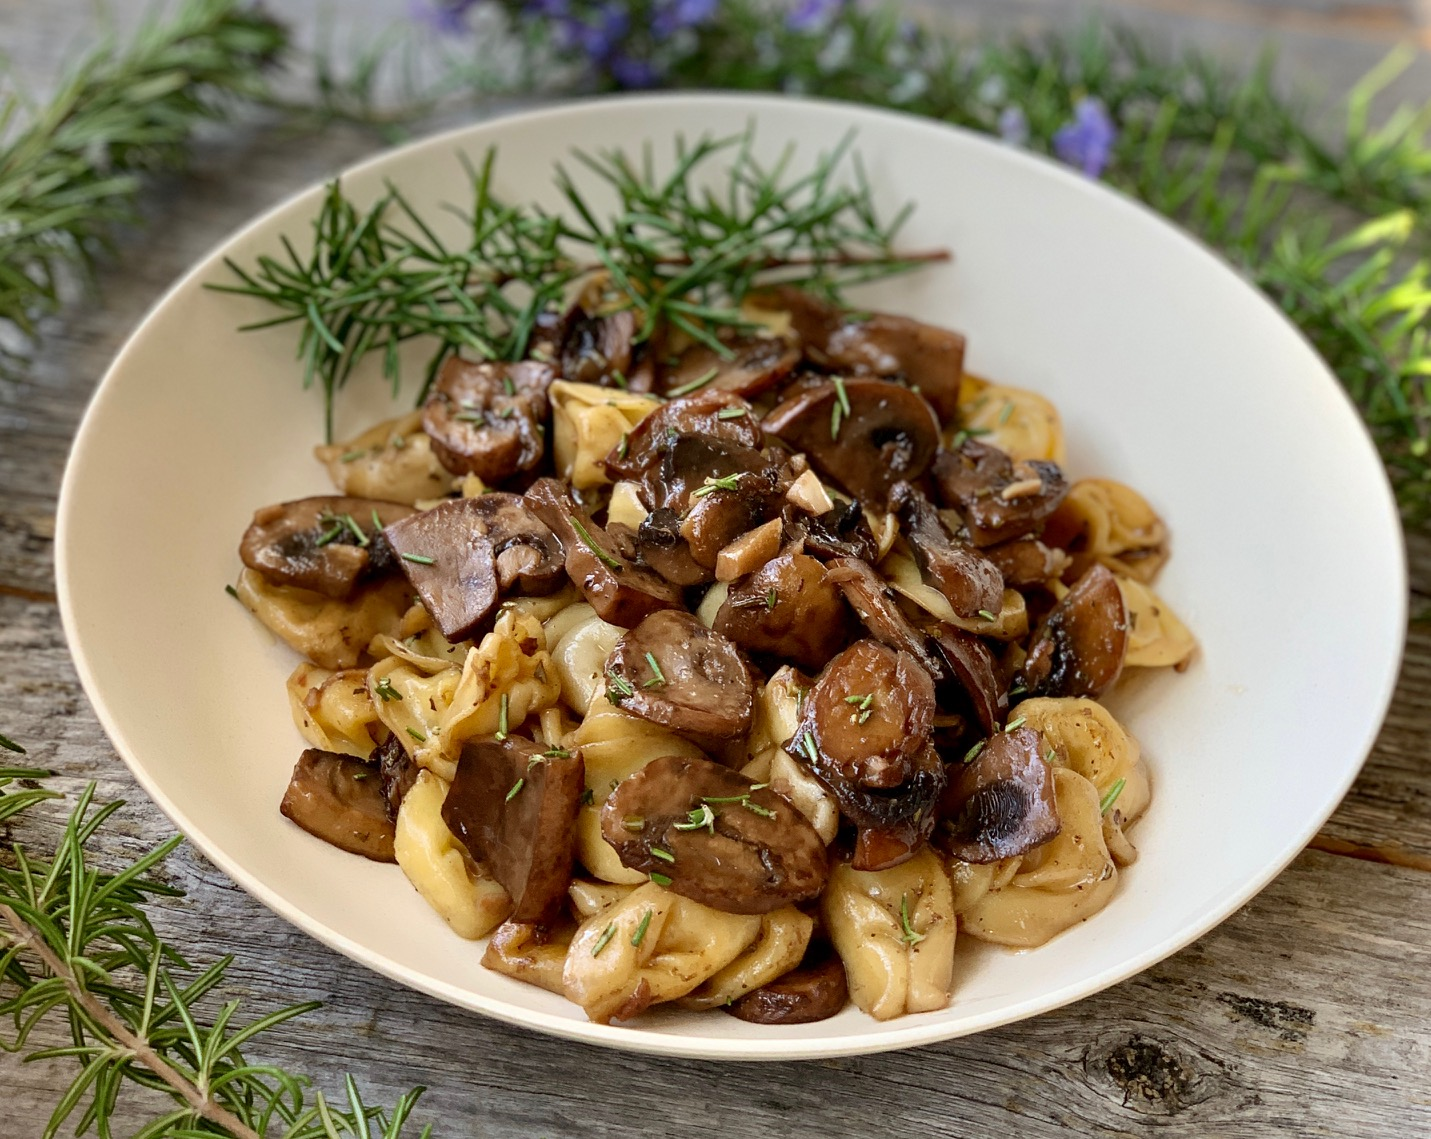 Garlic Mushrooms with Pasta